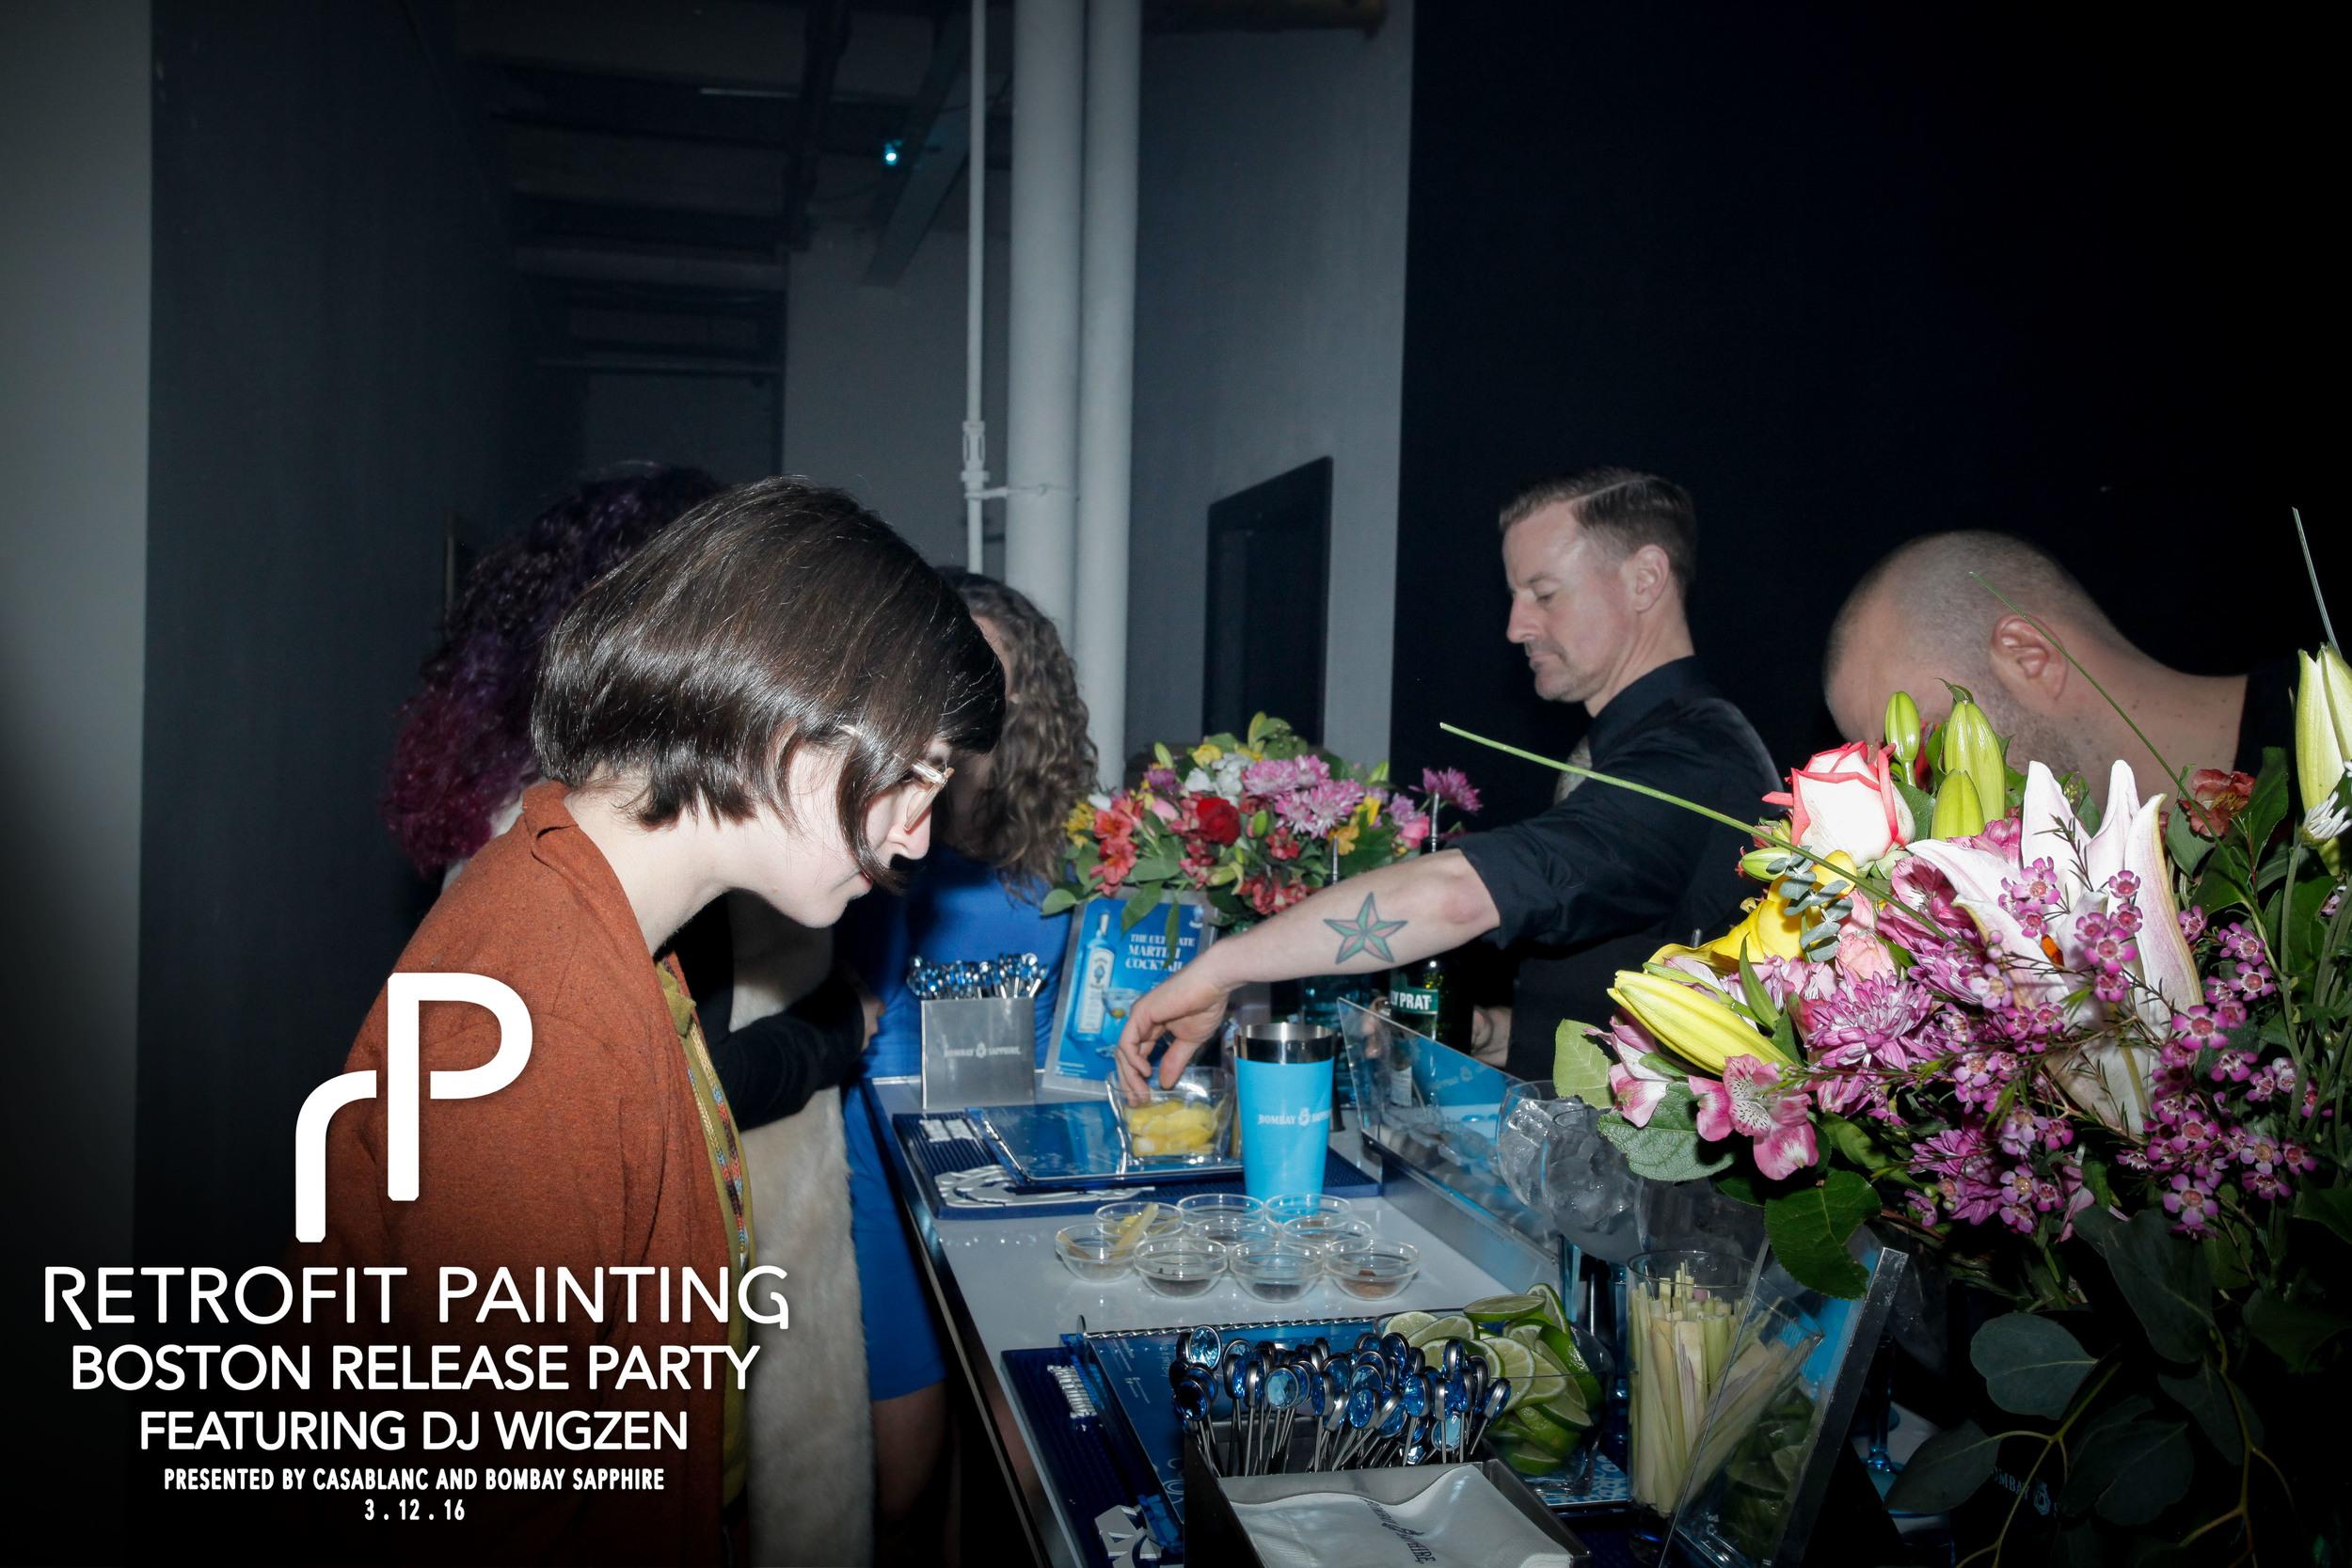 Retrofit Painting Boston Release Party 0021.jpg